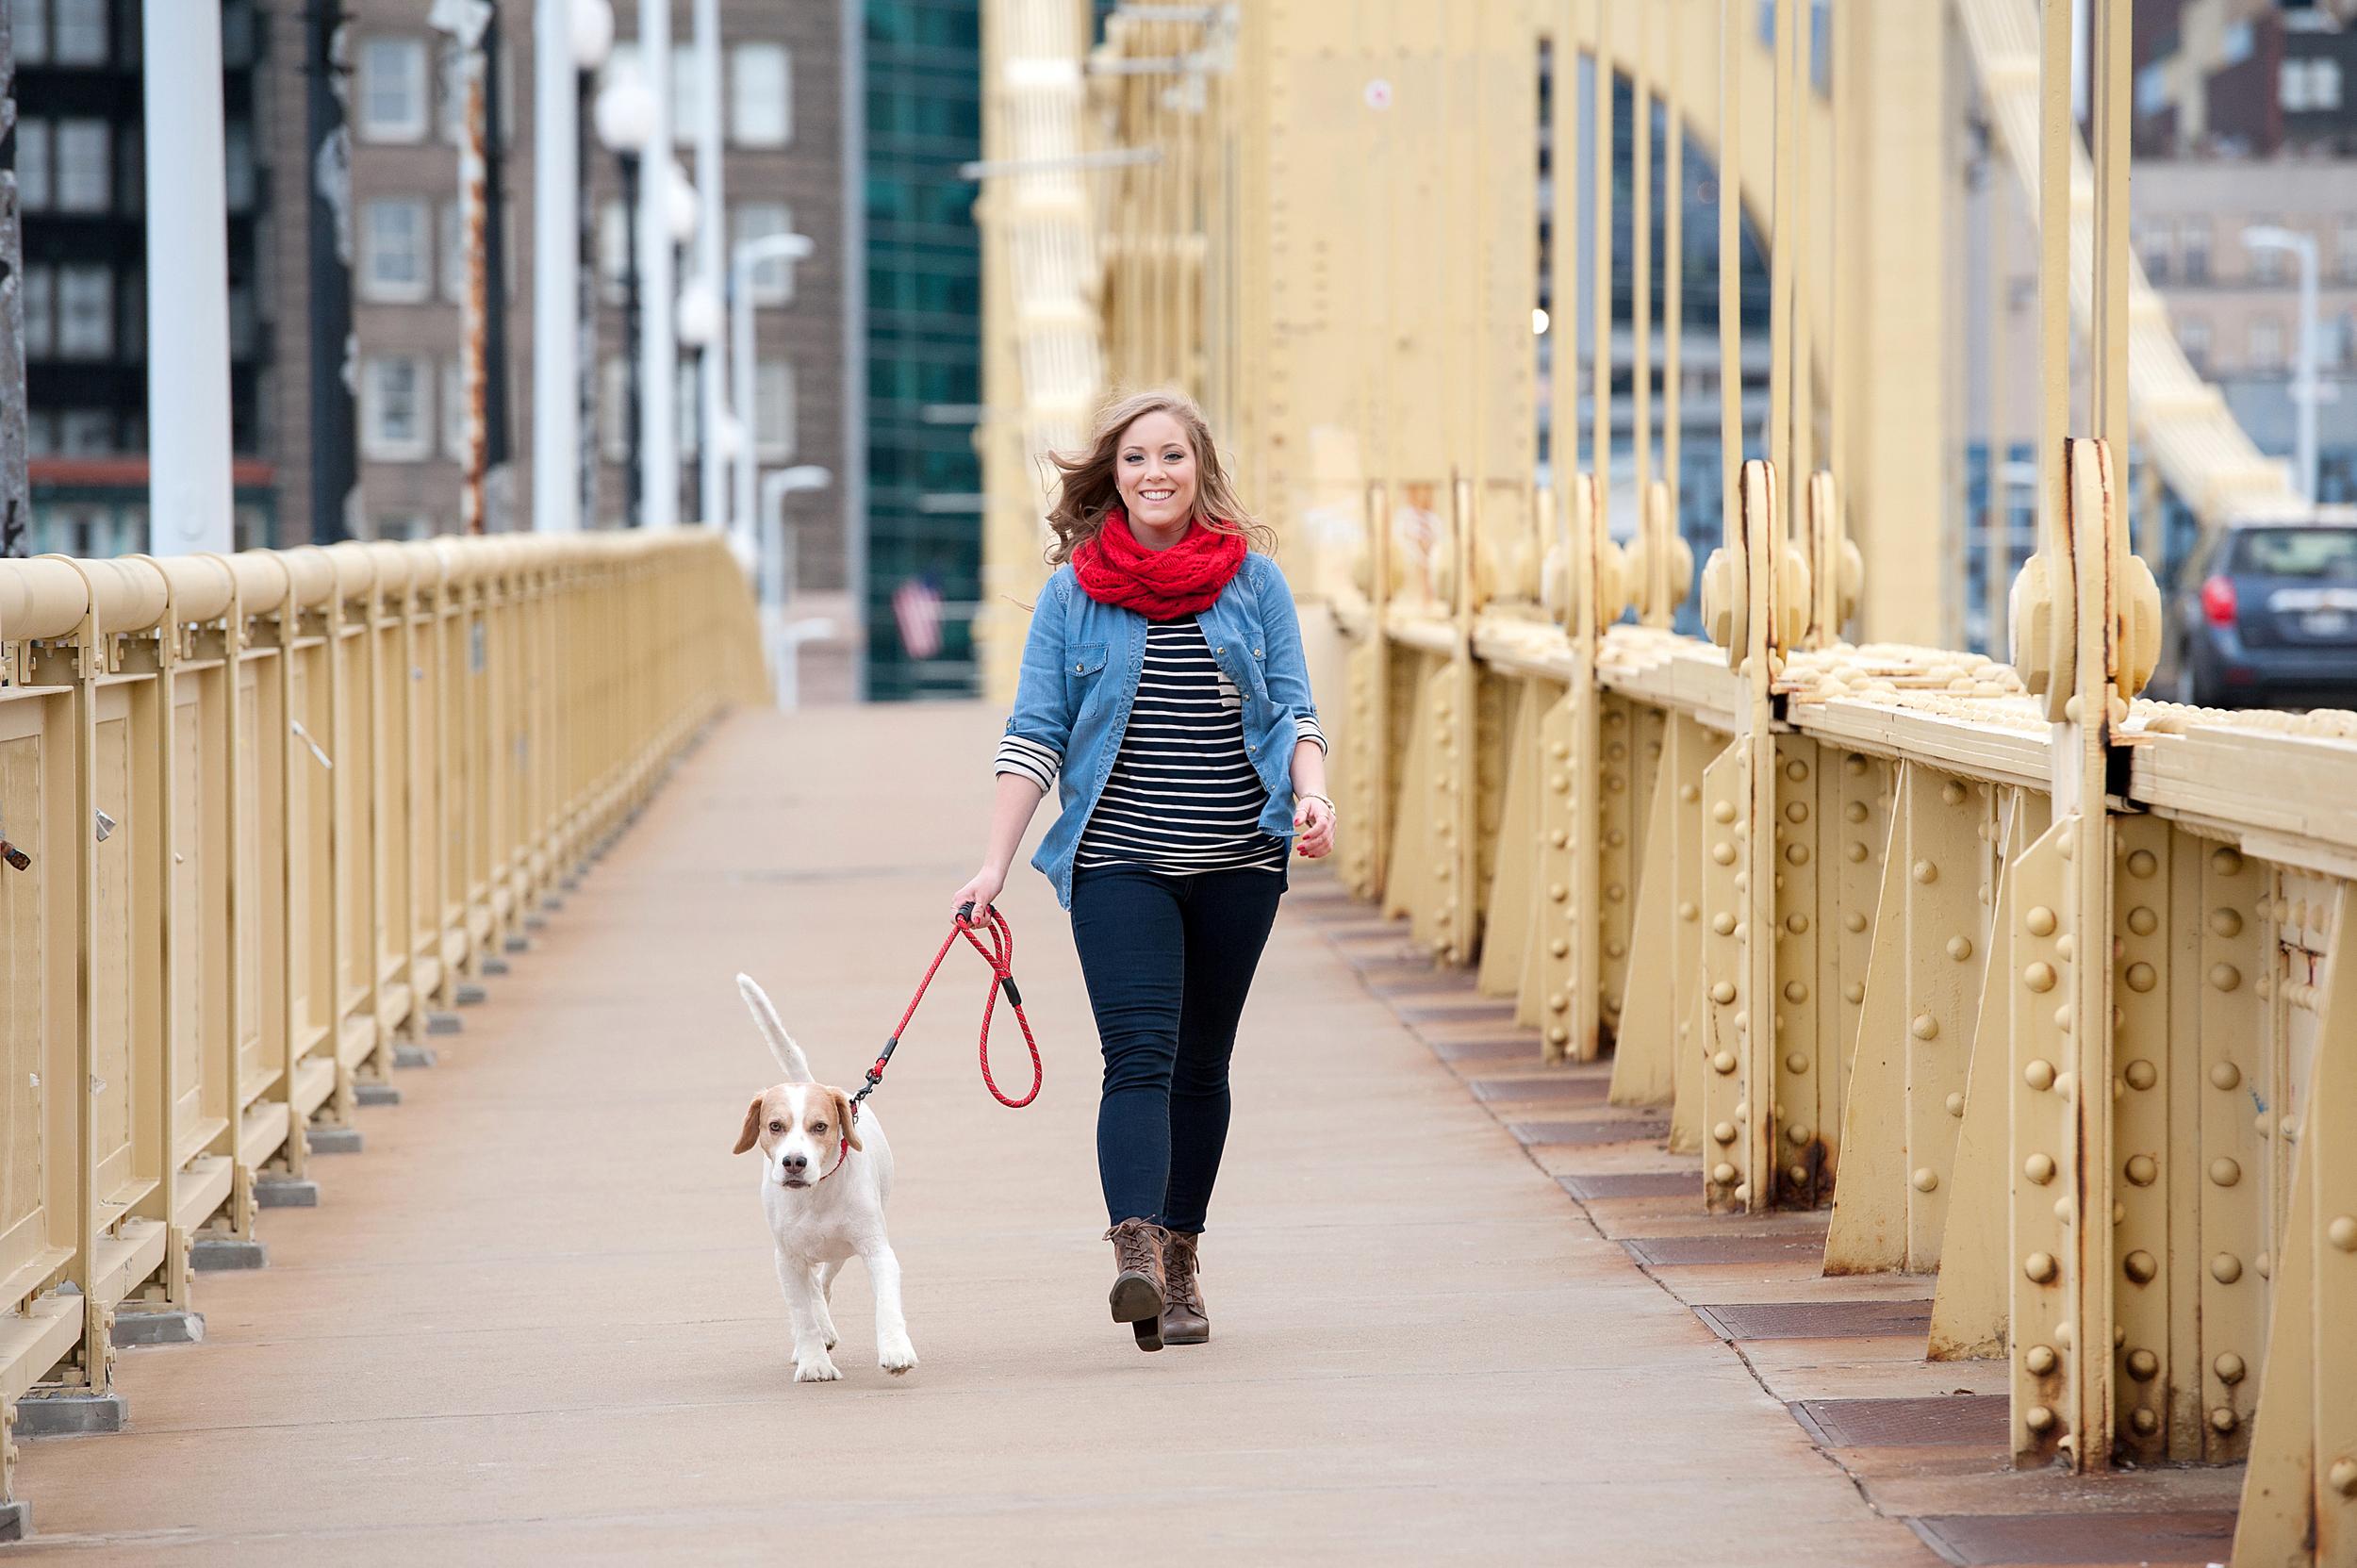 pittsburgh-north-shore-dog-photography-jenny-karlsson-014.jpg